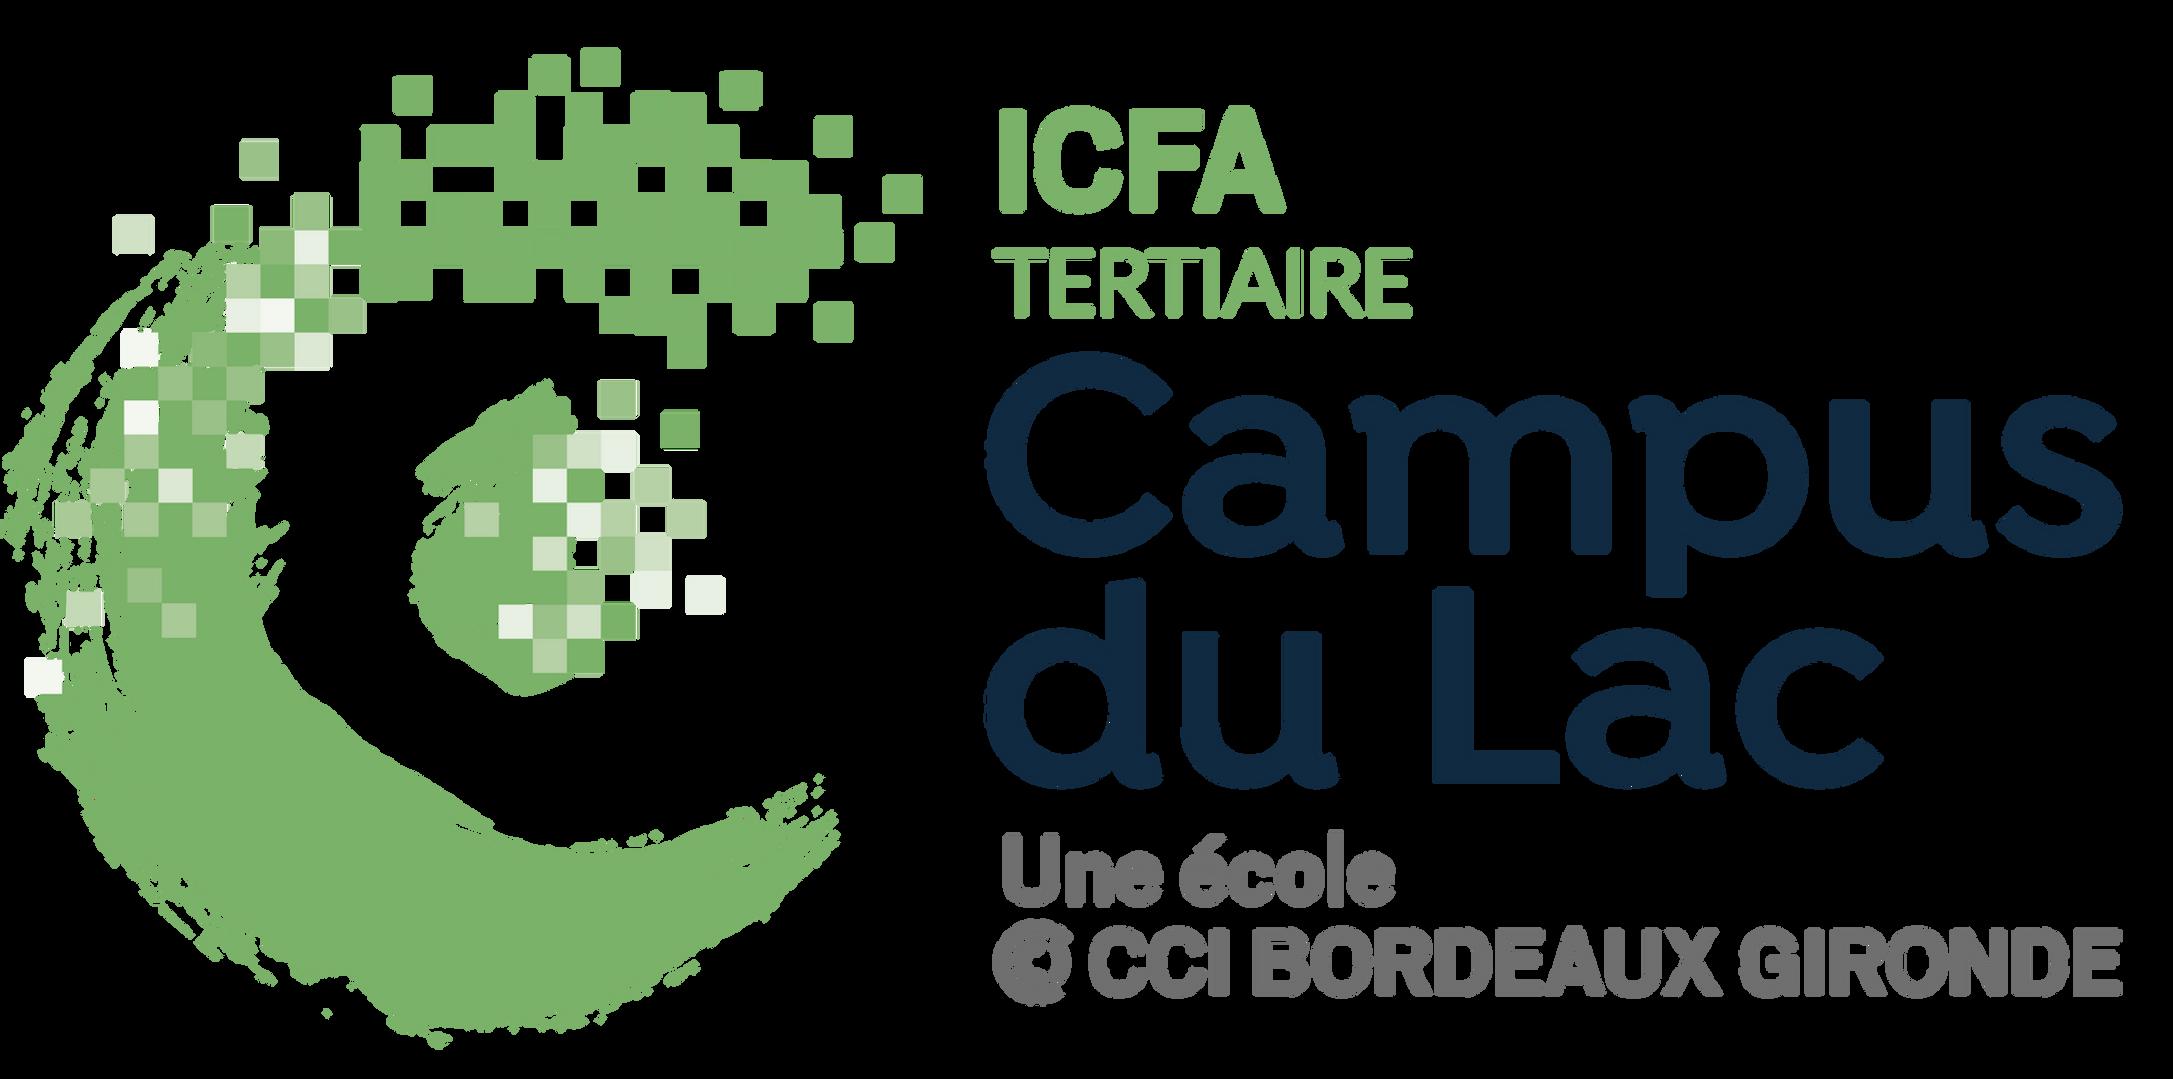 logo-ICFA-Tertiaire.png